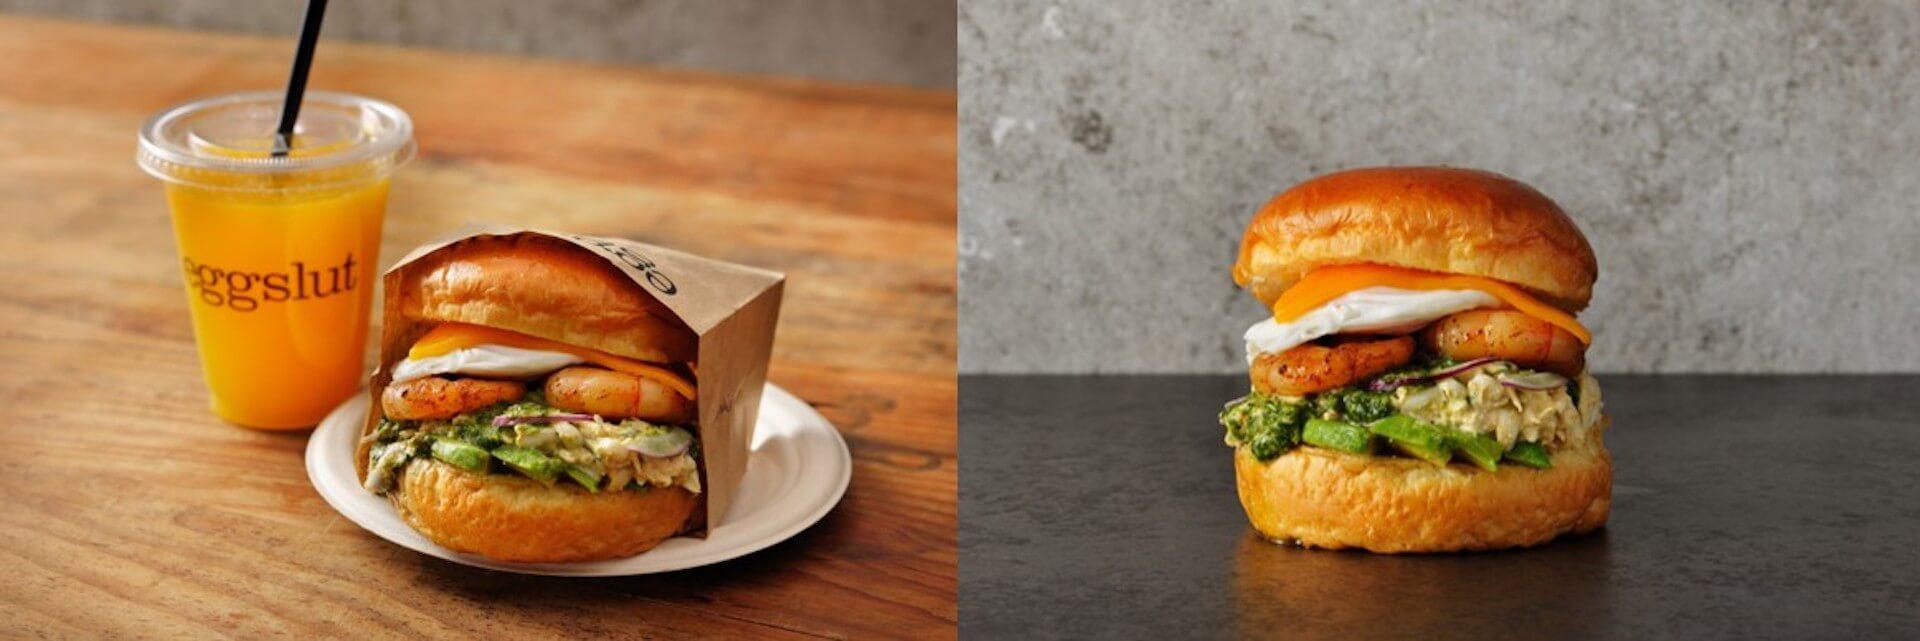 LA発の大人気卵料理専門店「eggslut」がMIYASHITA PARK内にオープン!映画『STAND STRONG』とのコラボキャンペーンも gourmet200729_eggslut_2